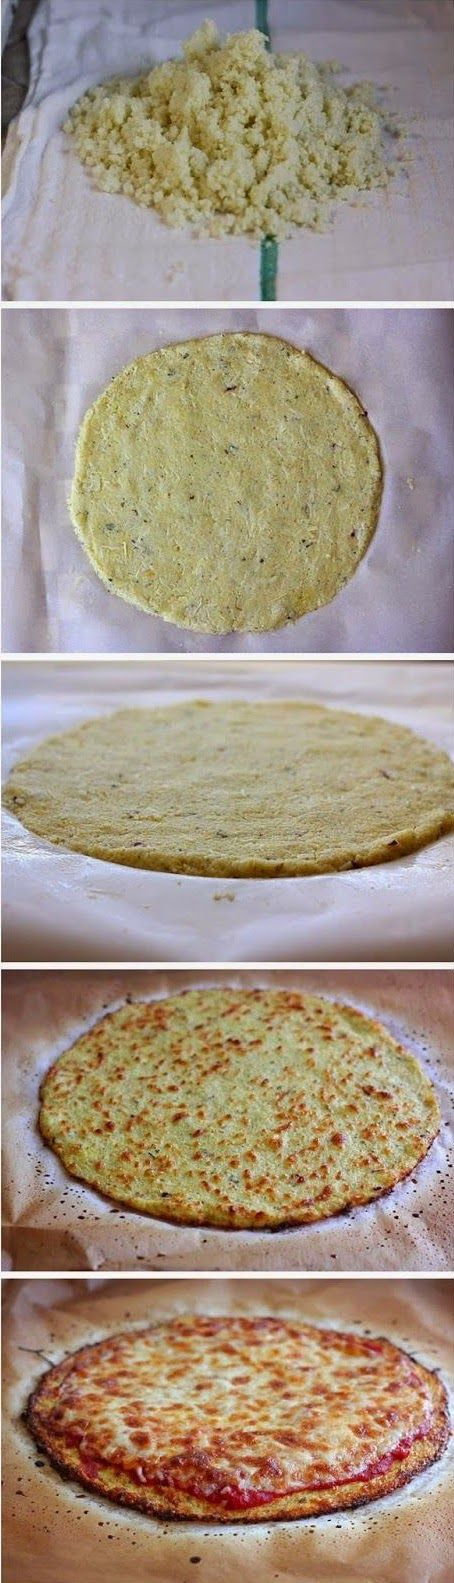 Cook it Quick: The Best Cauliflower Crust Pizza